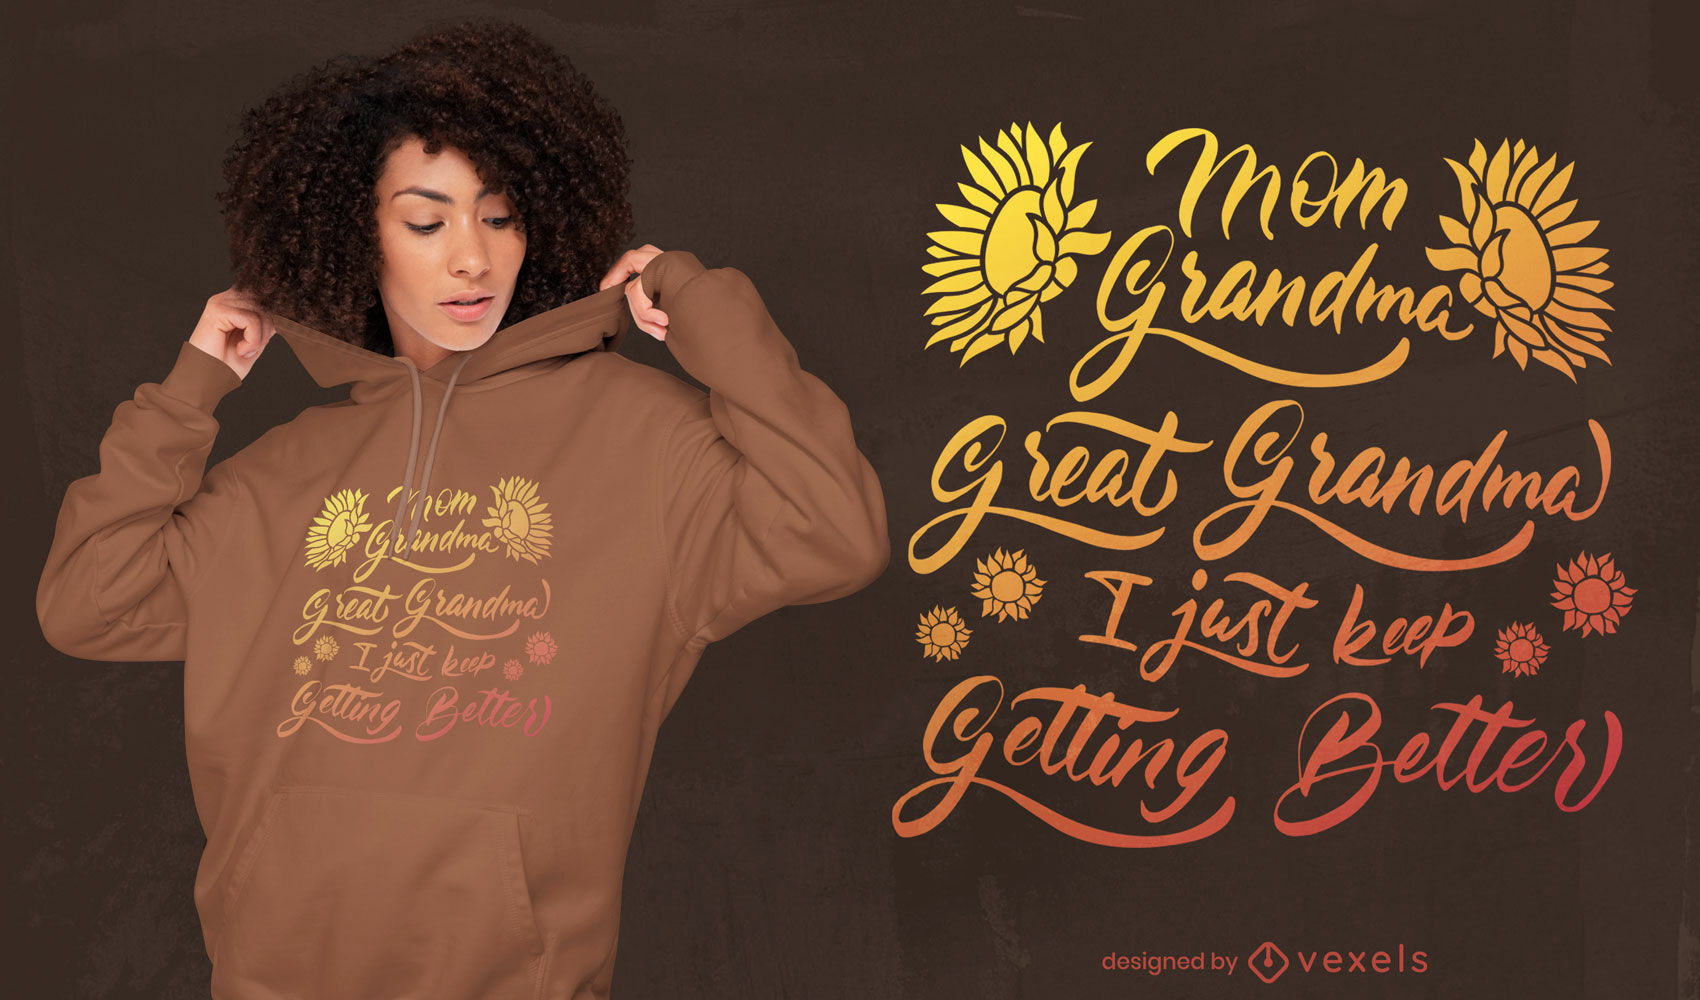 Diseño de camiseta de cita divertida de la familia de la abuela